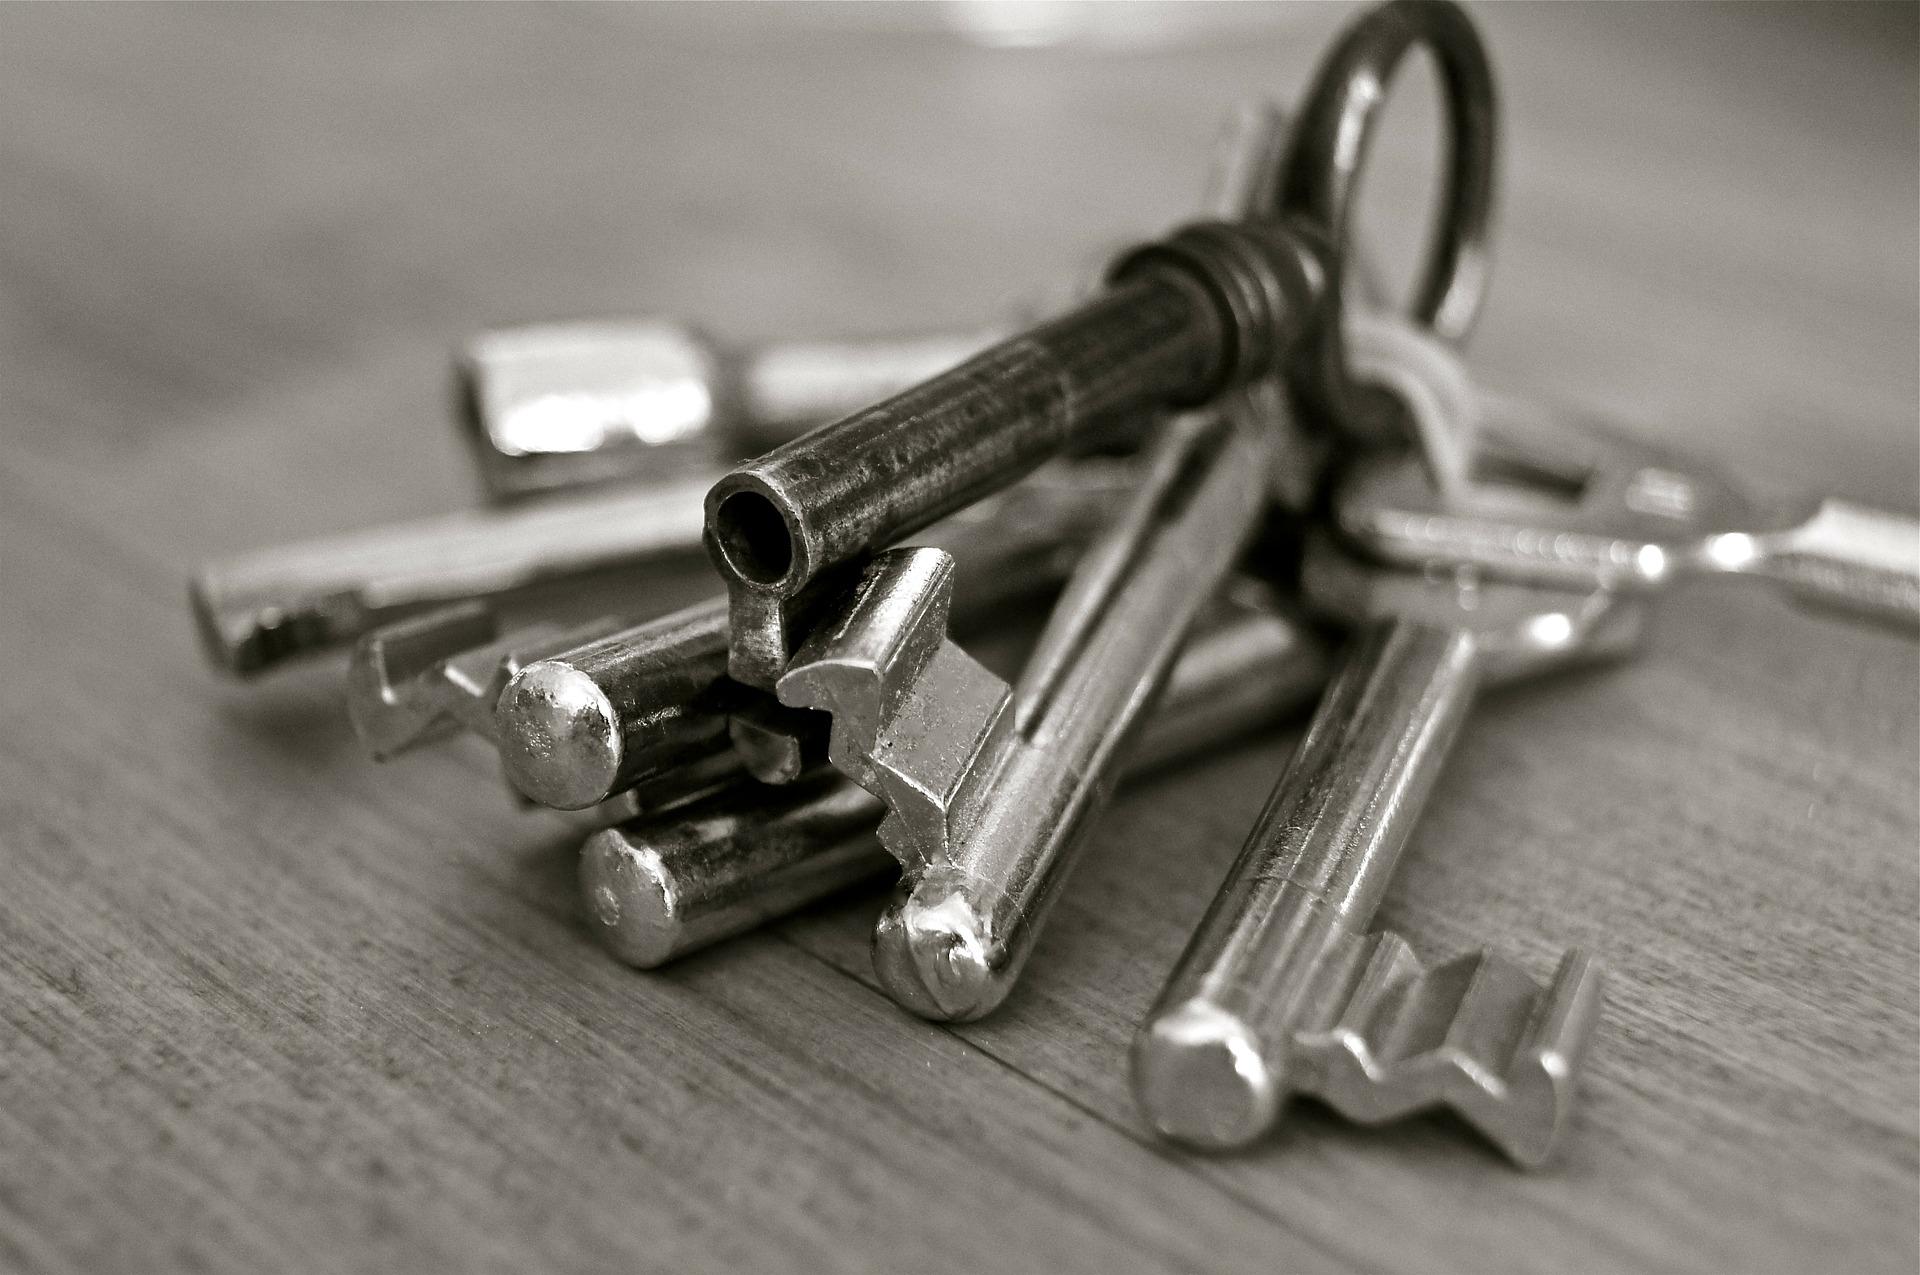 key-96233_1920.jpg